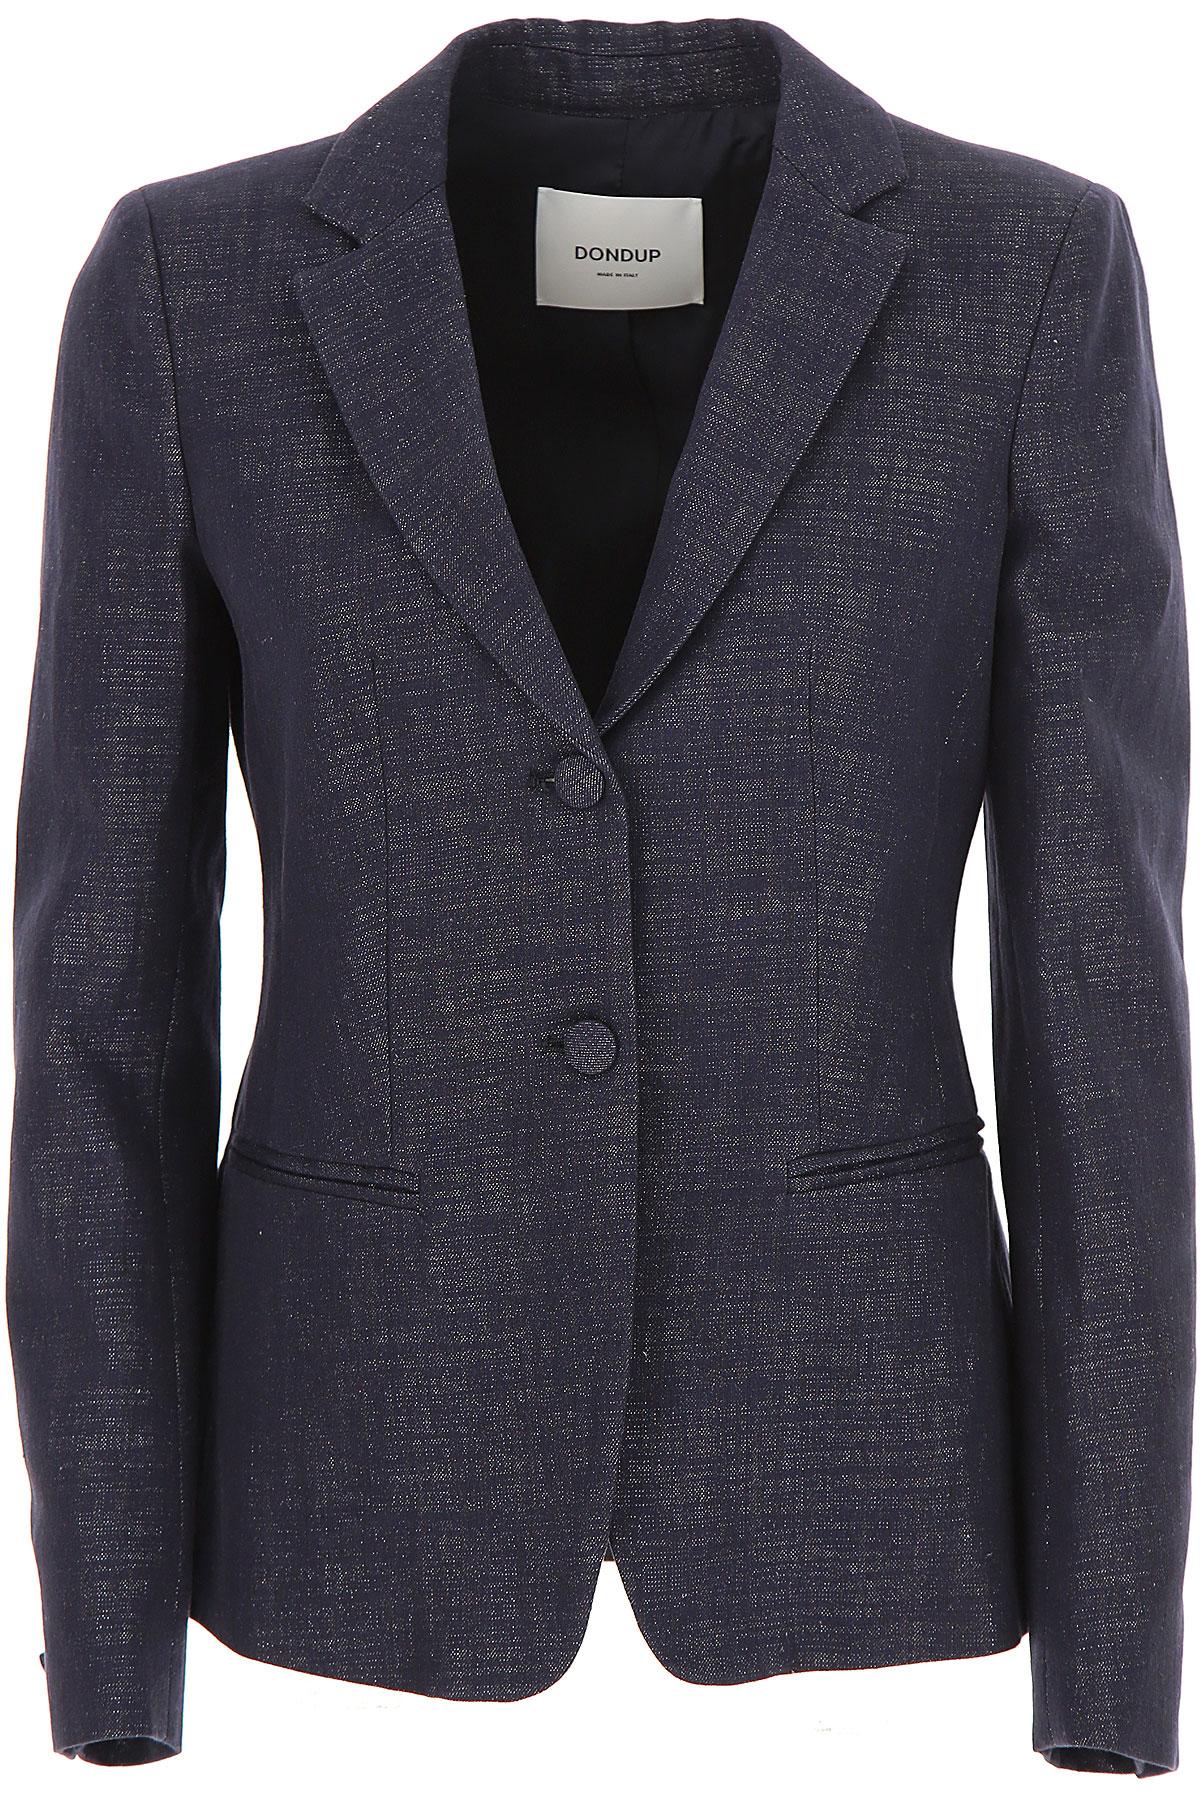 Dondup Blazer for Women On Sale, Navy Blue, Cotton, 2019, 4 8